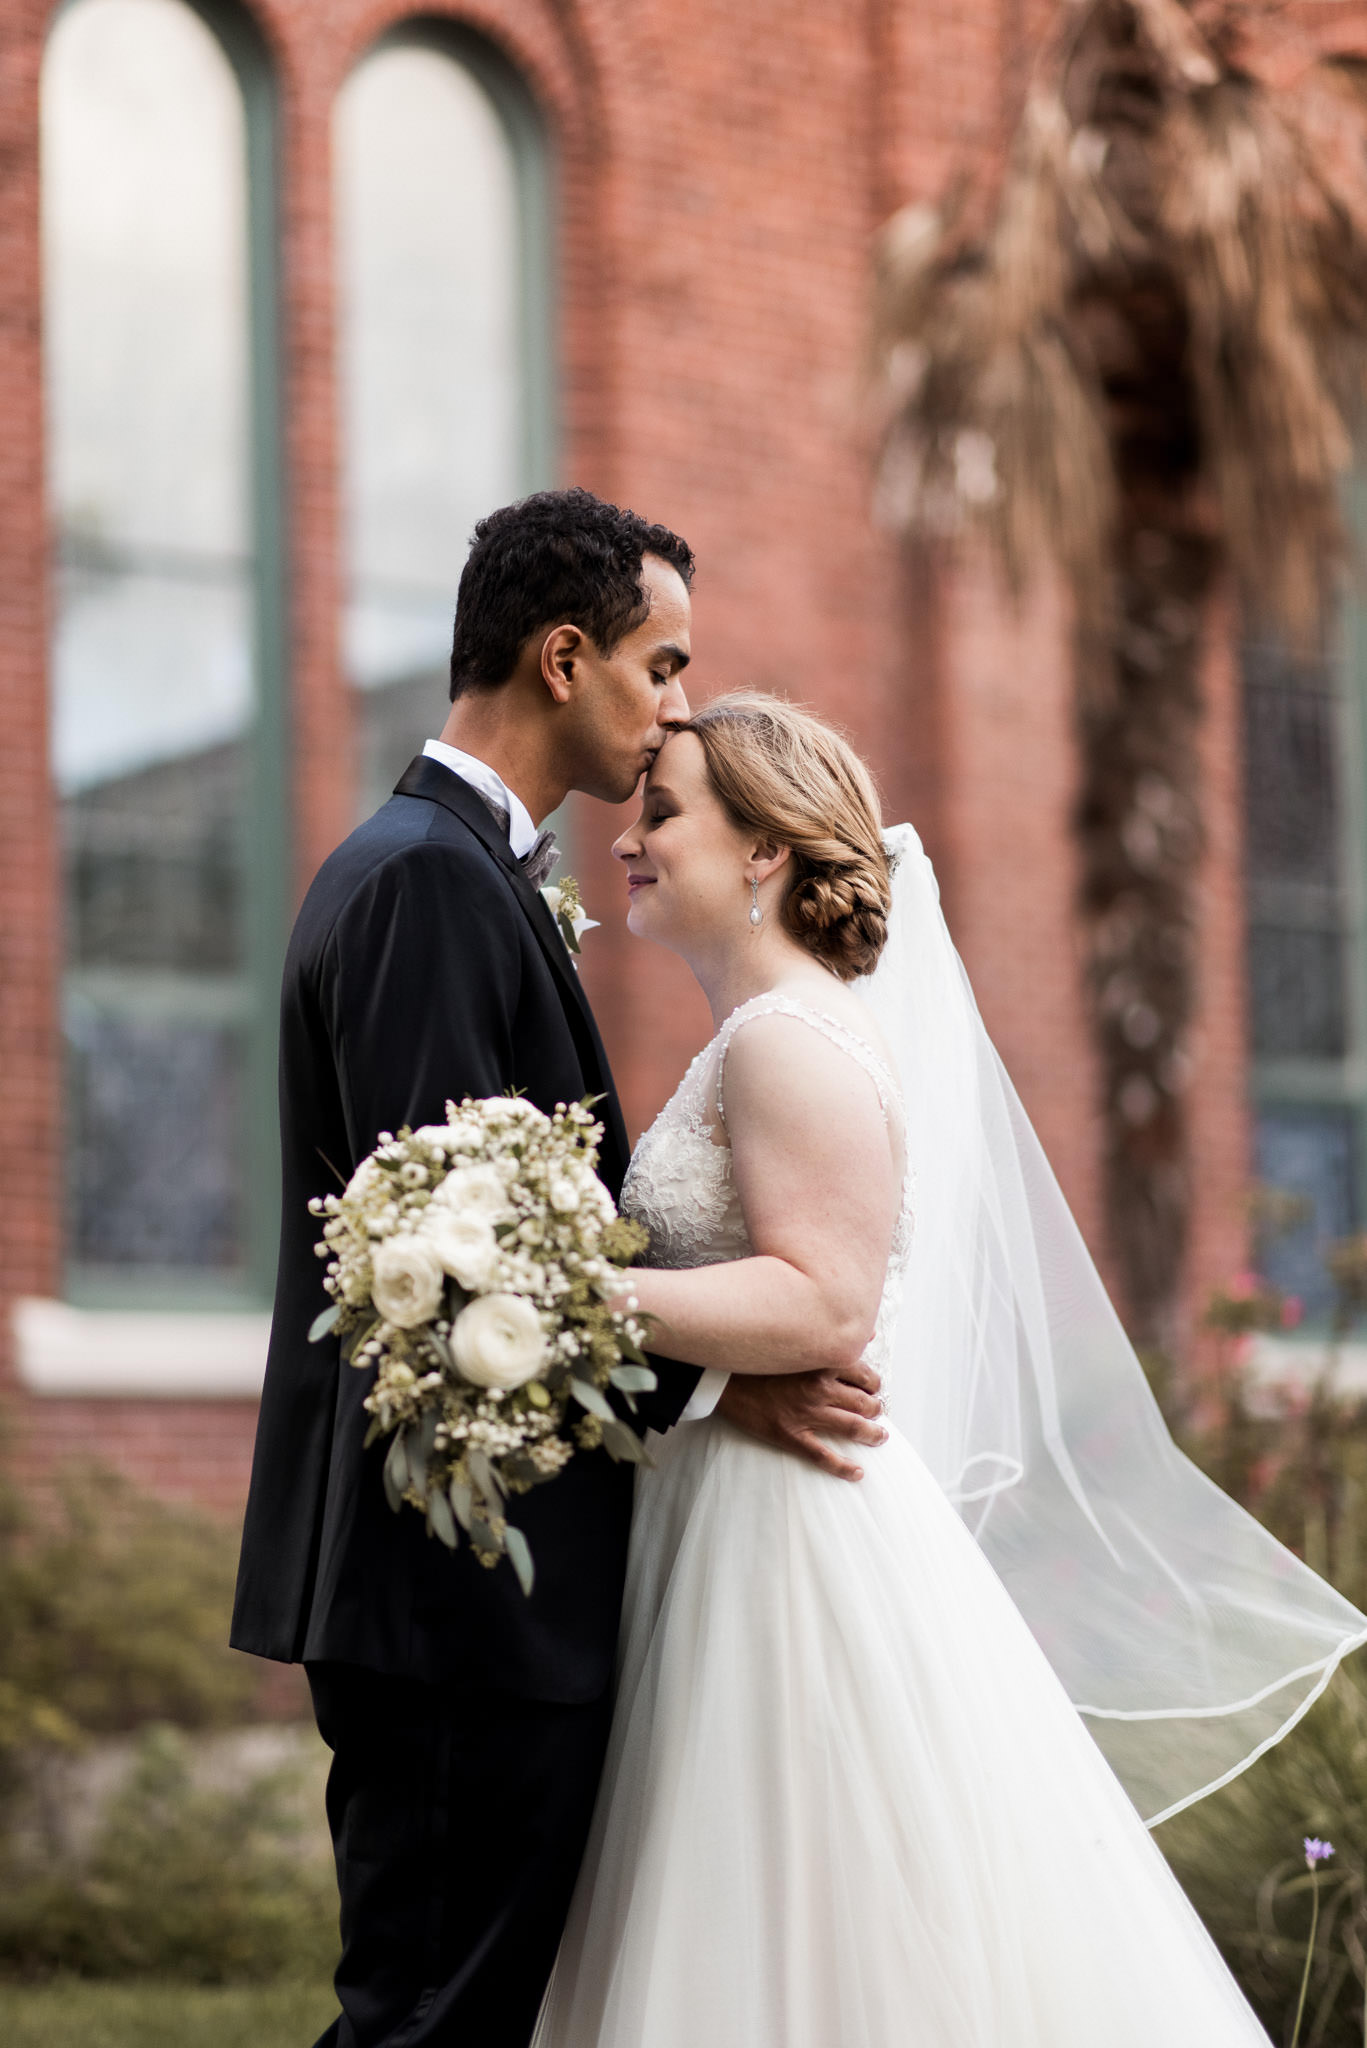 nicole-fellipe-wedding-sm-17.jpg